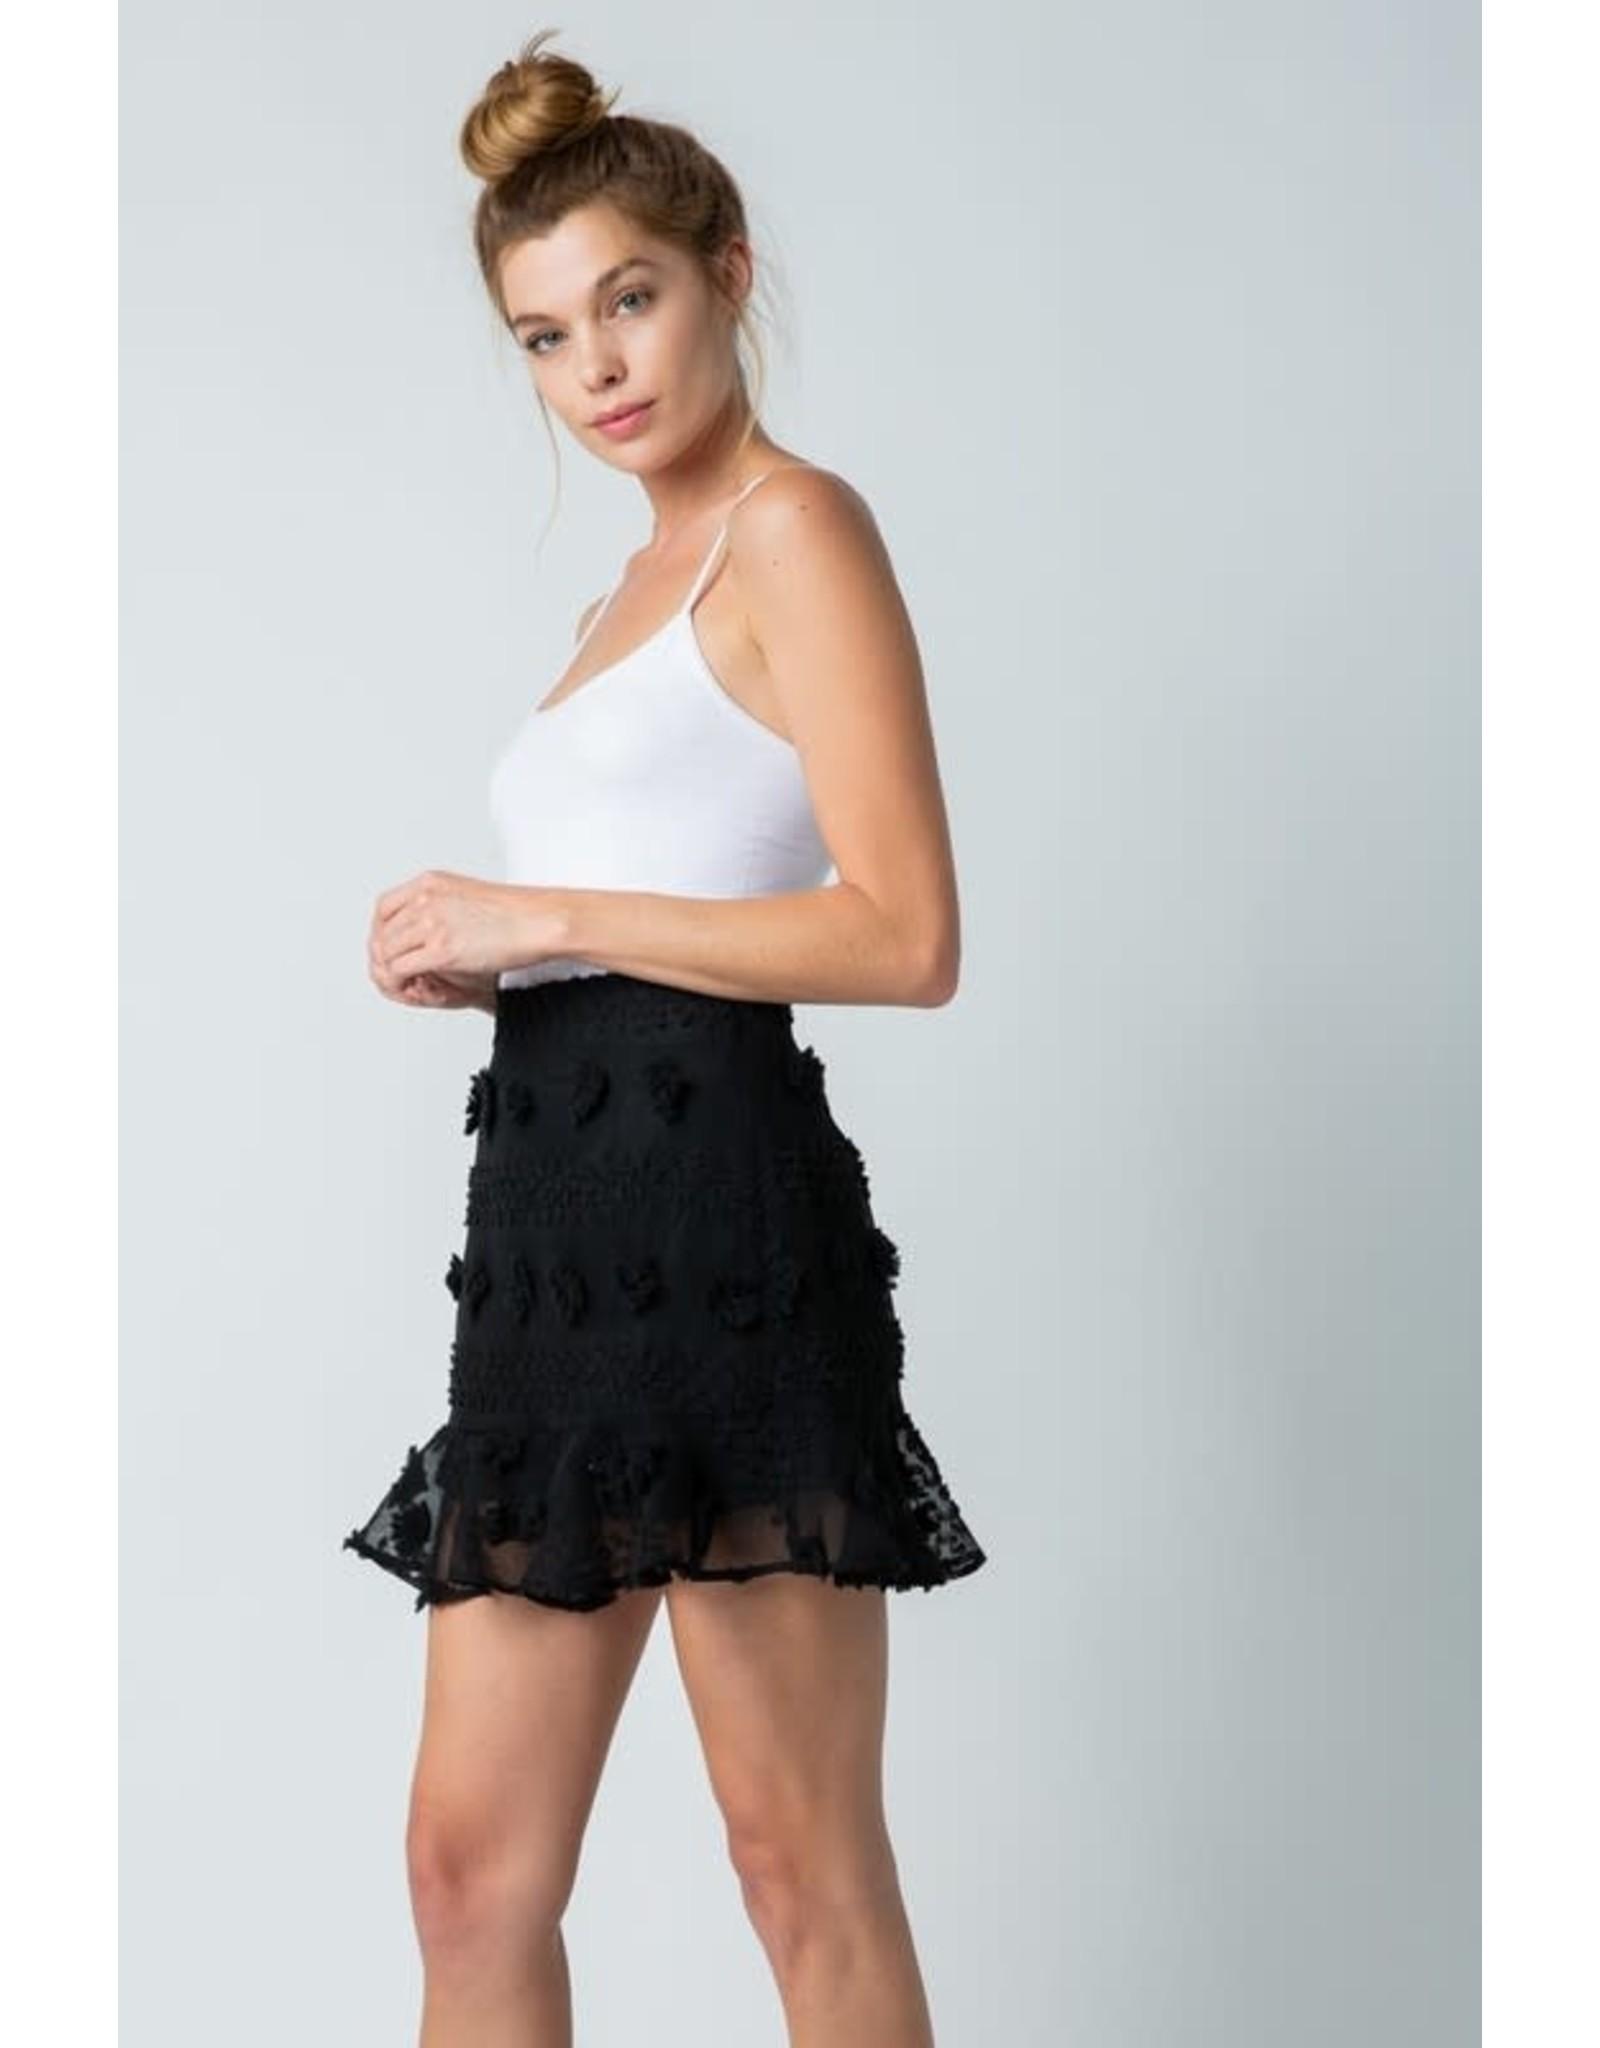 Good Vibes Only Skirt